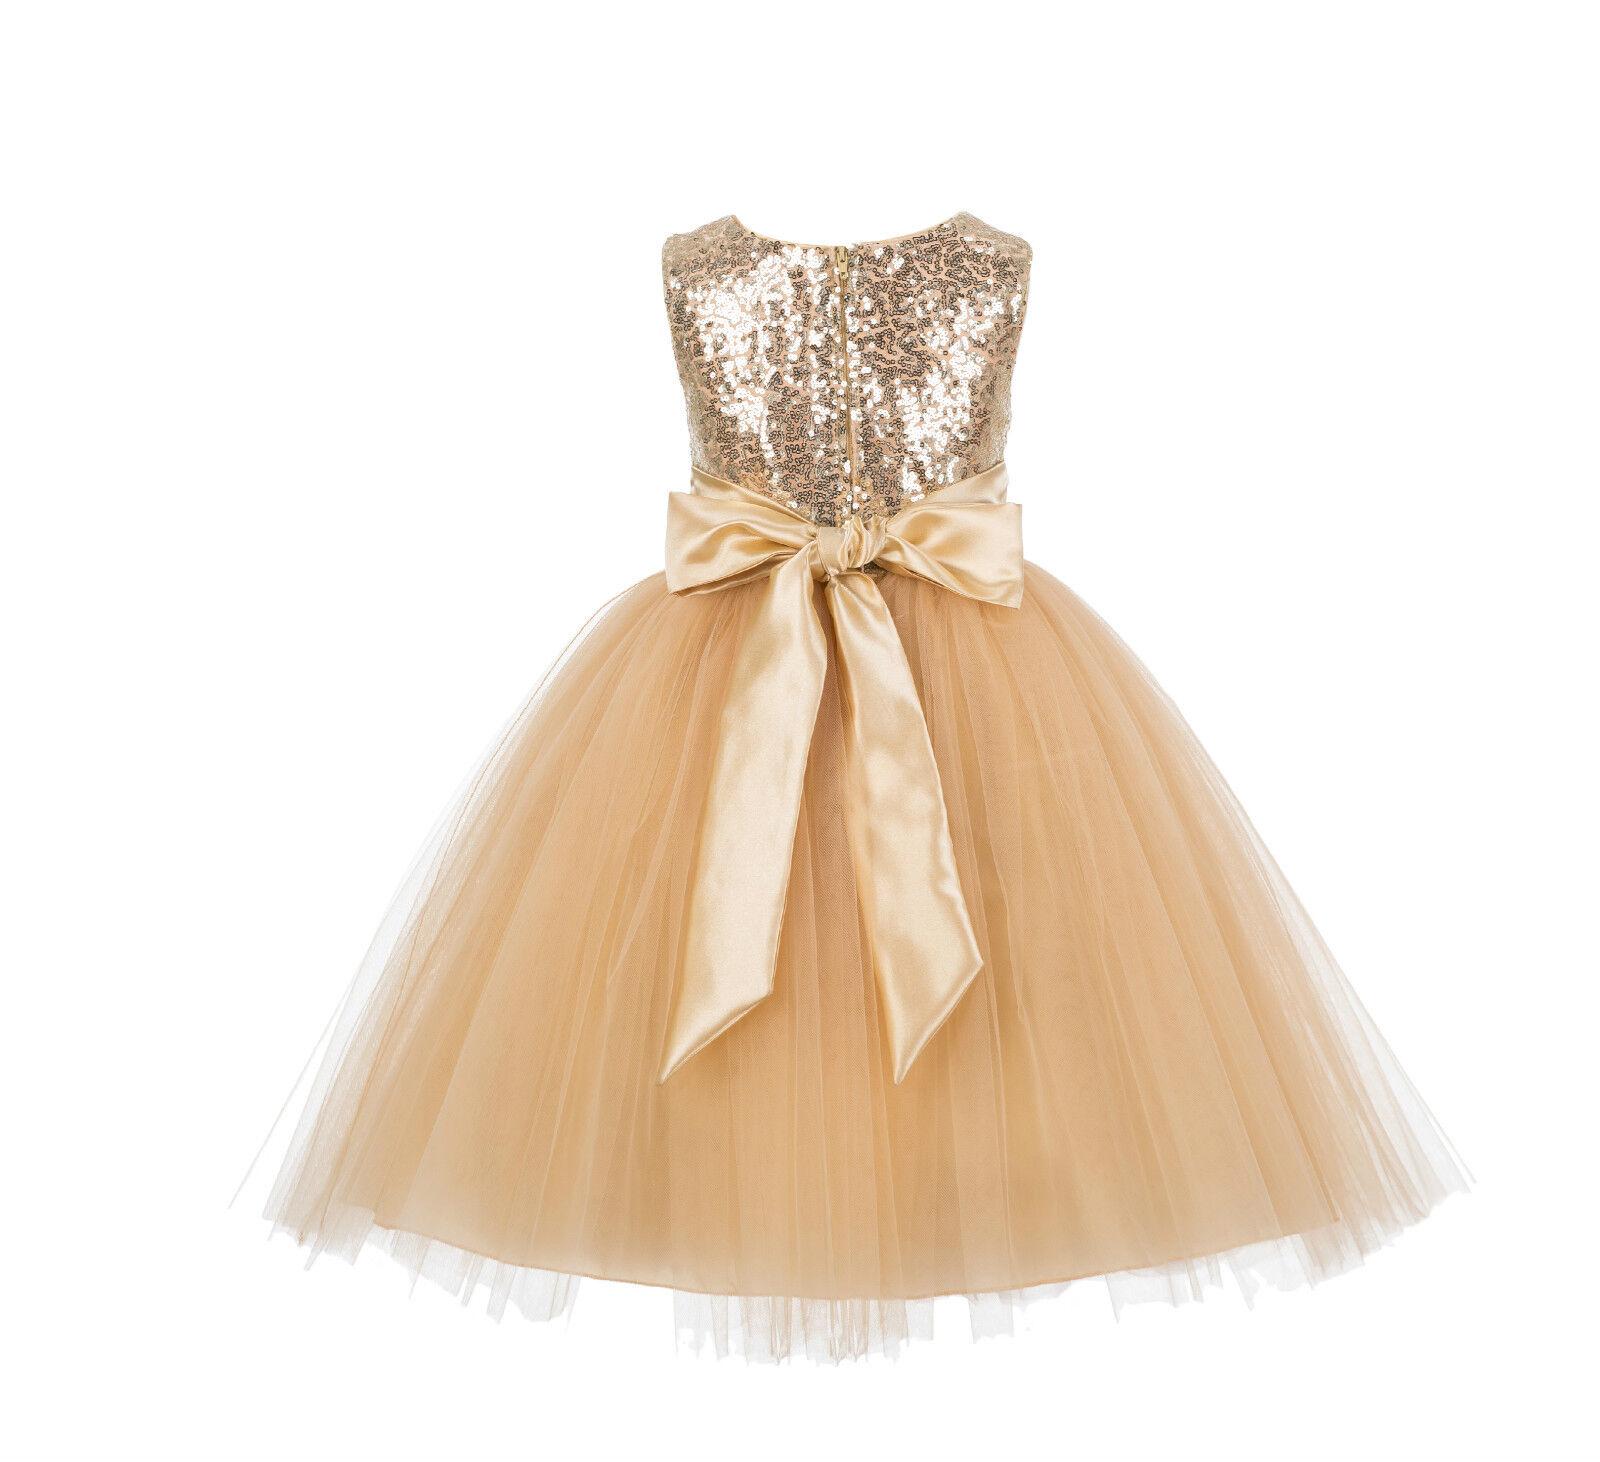 Wedding Formal Sequins Mesh Flower Girl Dresses Tulle Birthday Graduation J122F